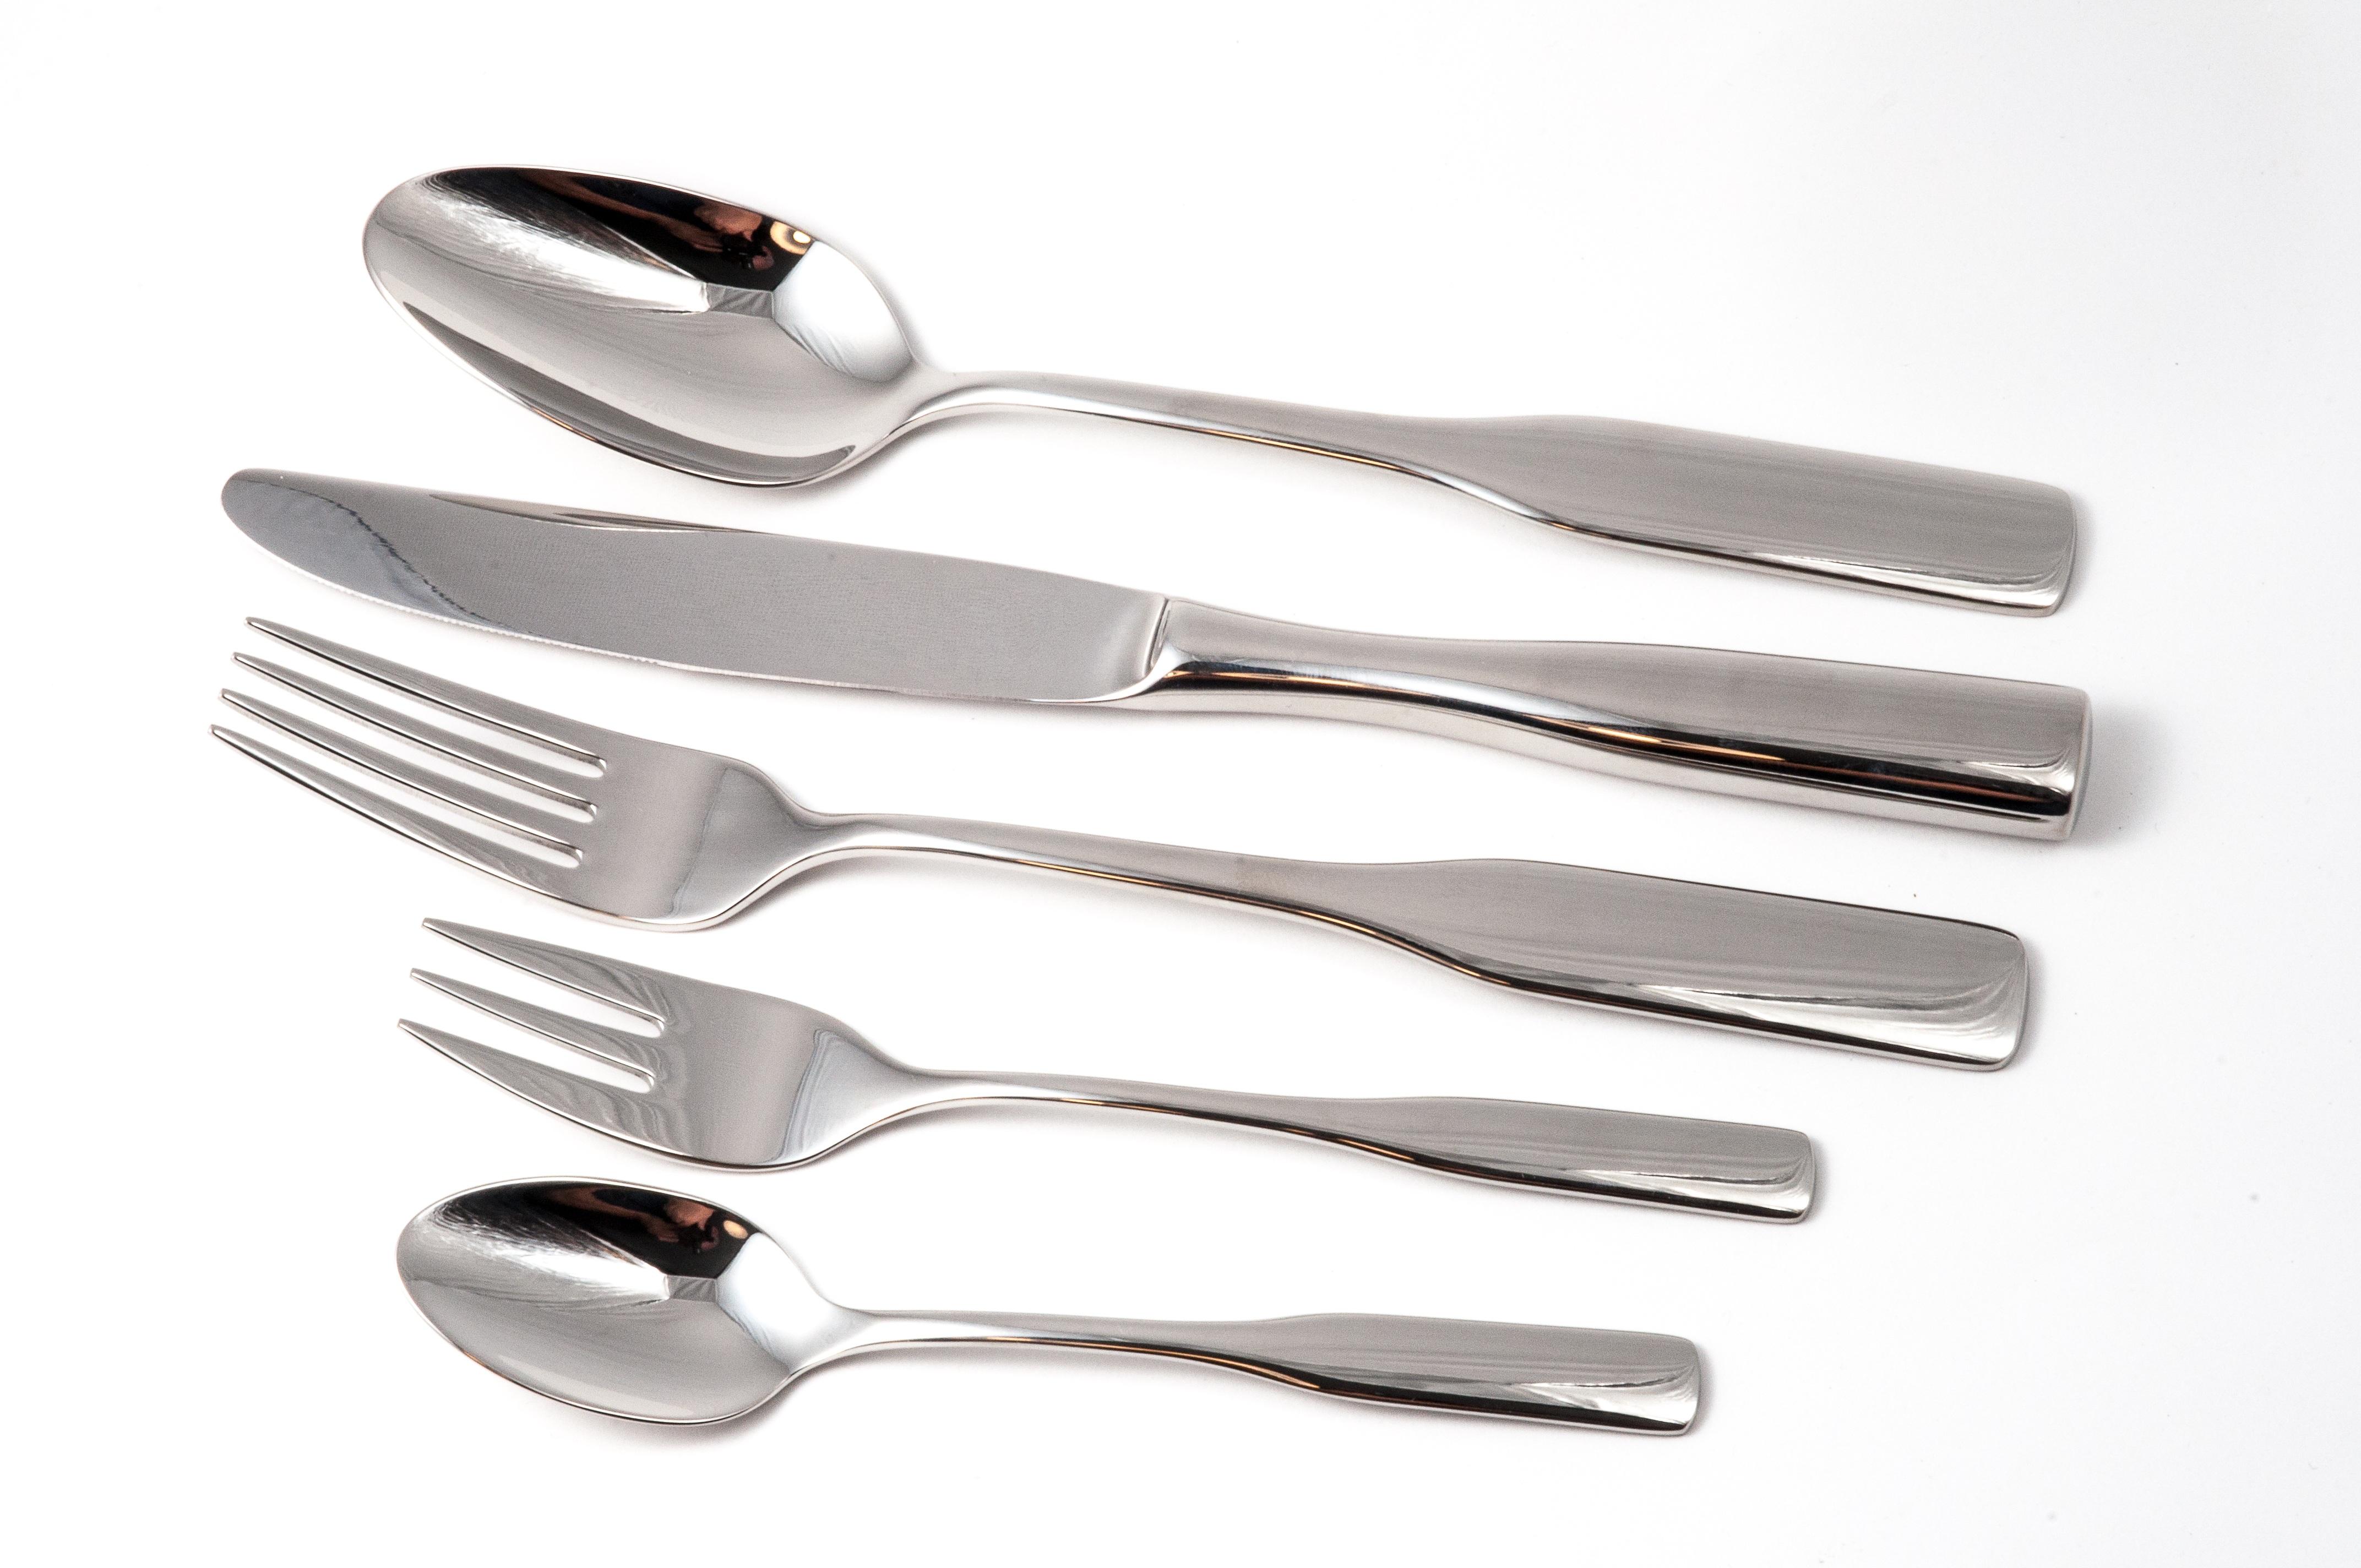 Silver Spoon Near Silver Kitchen Knife Free Stock Photo